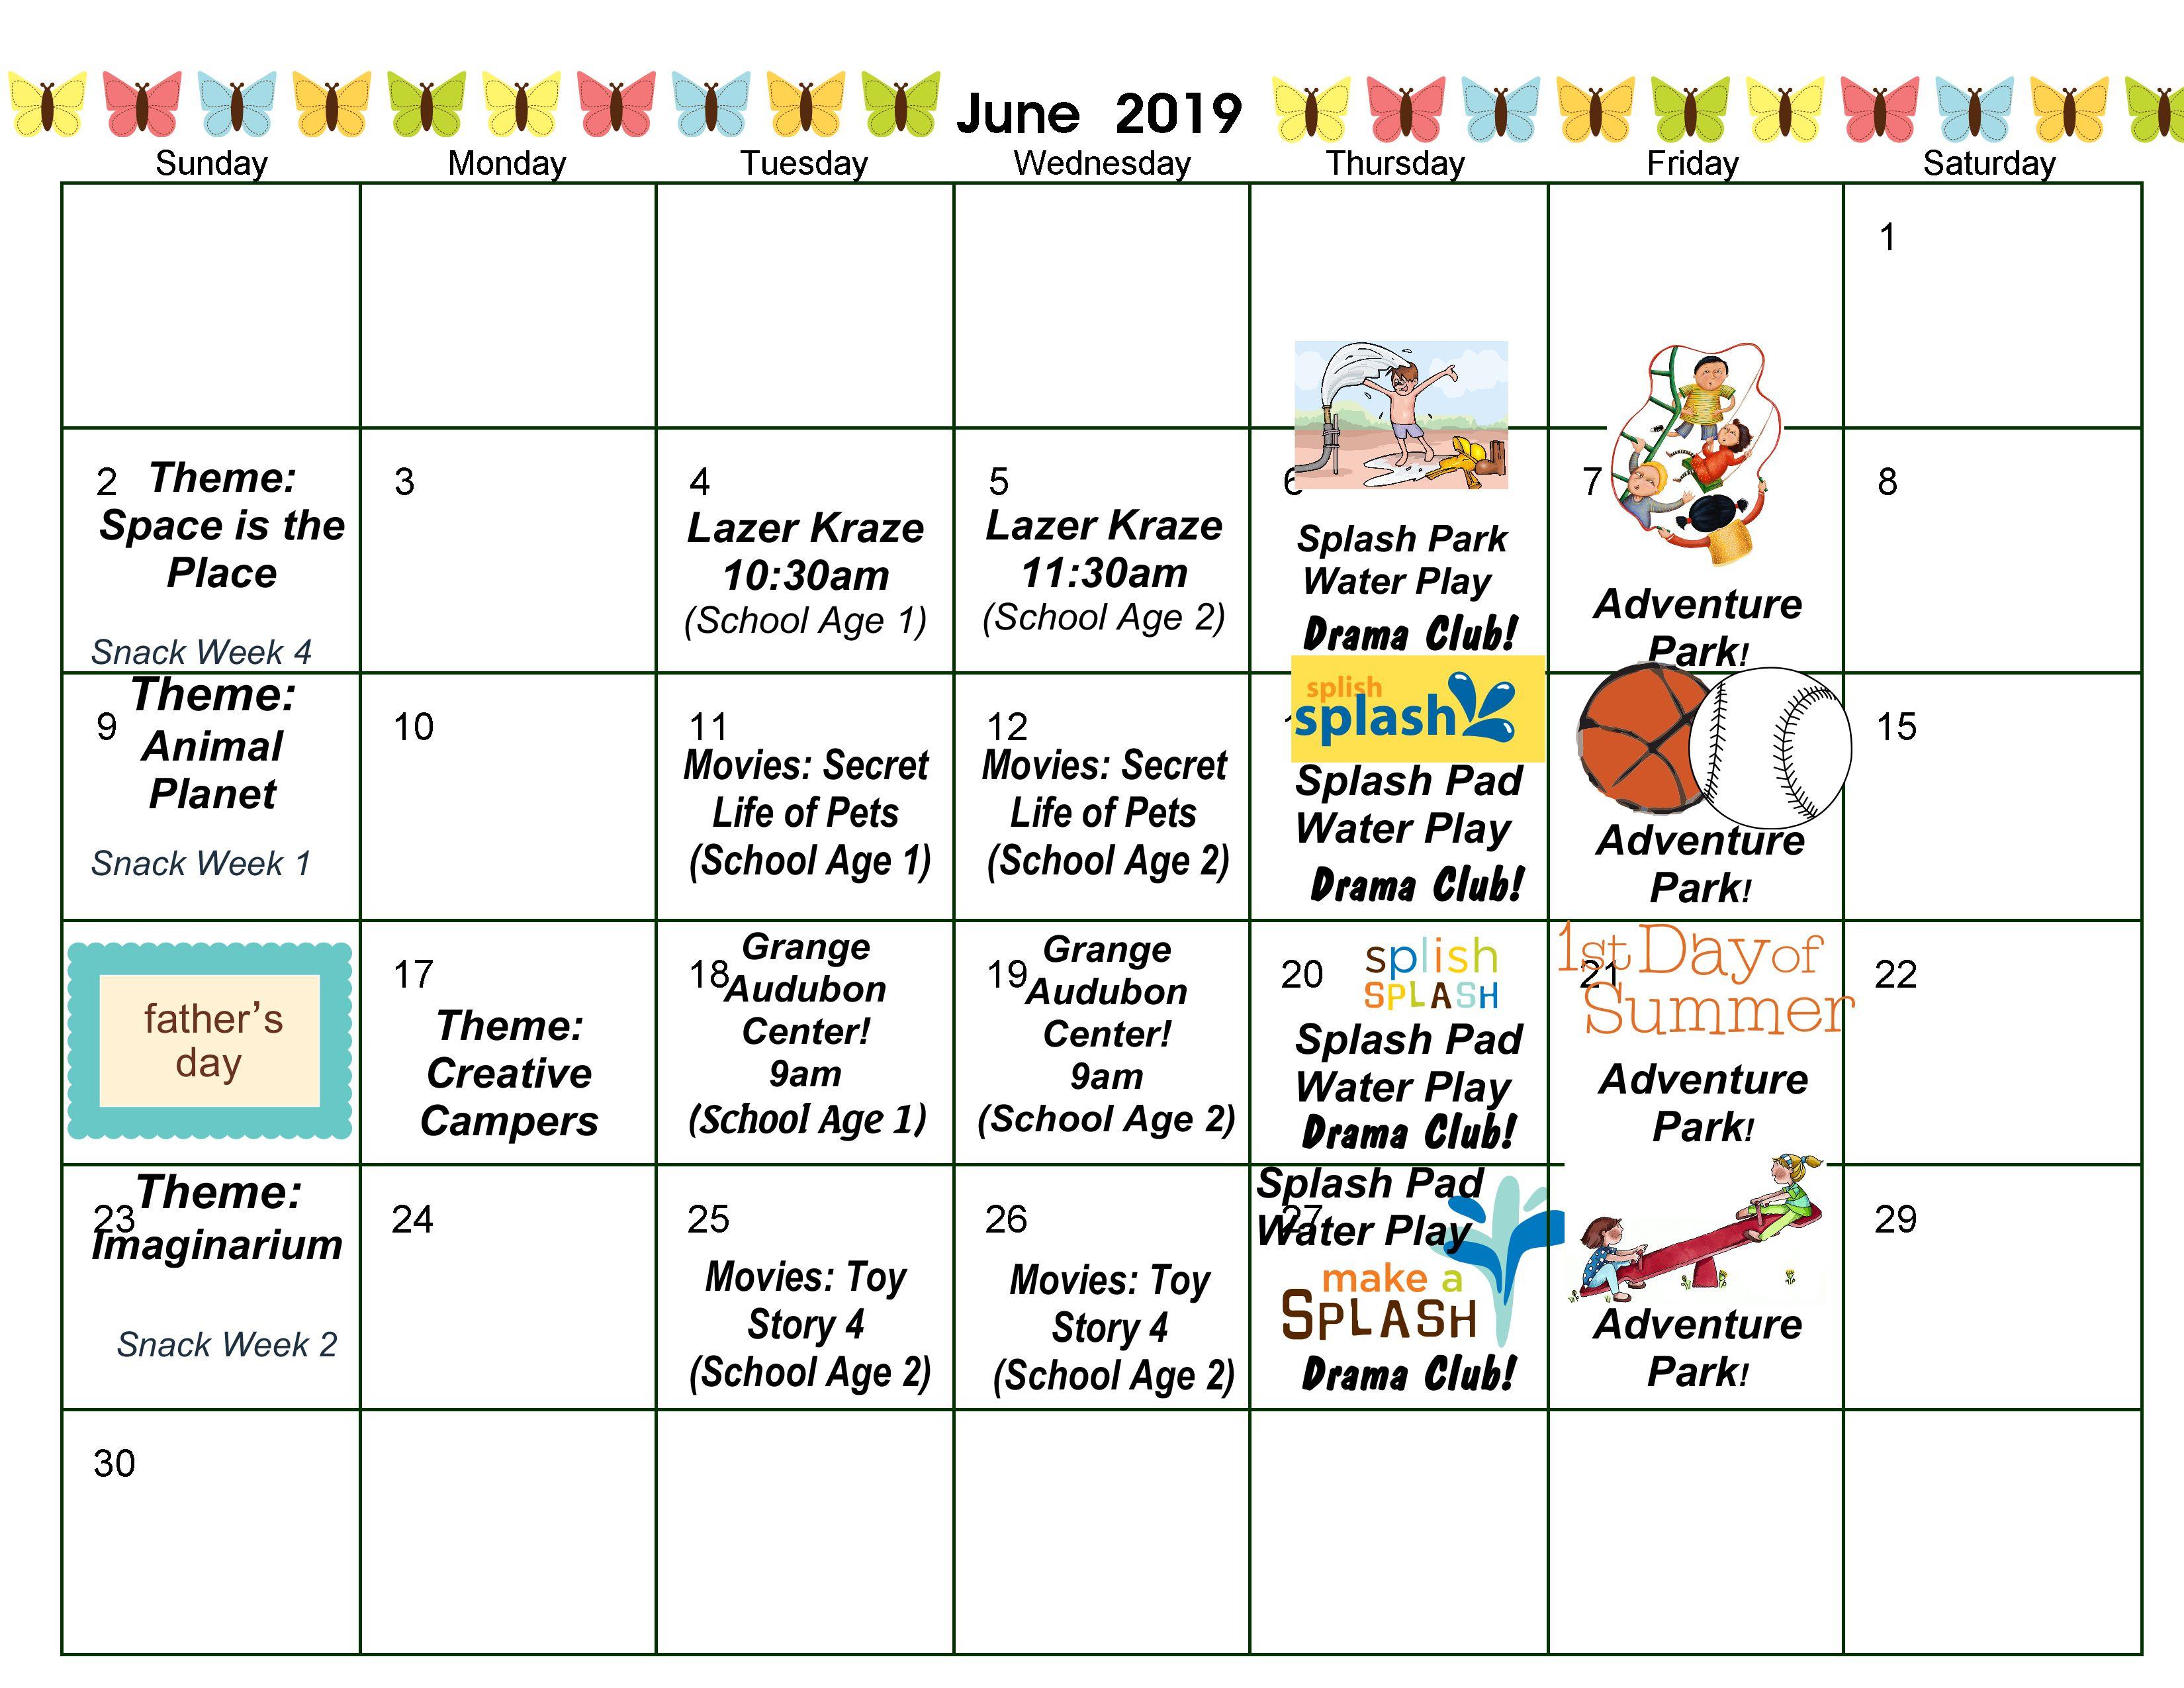 2019-6 SA June Calendar-001.jpg